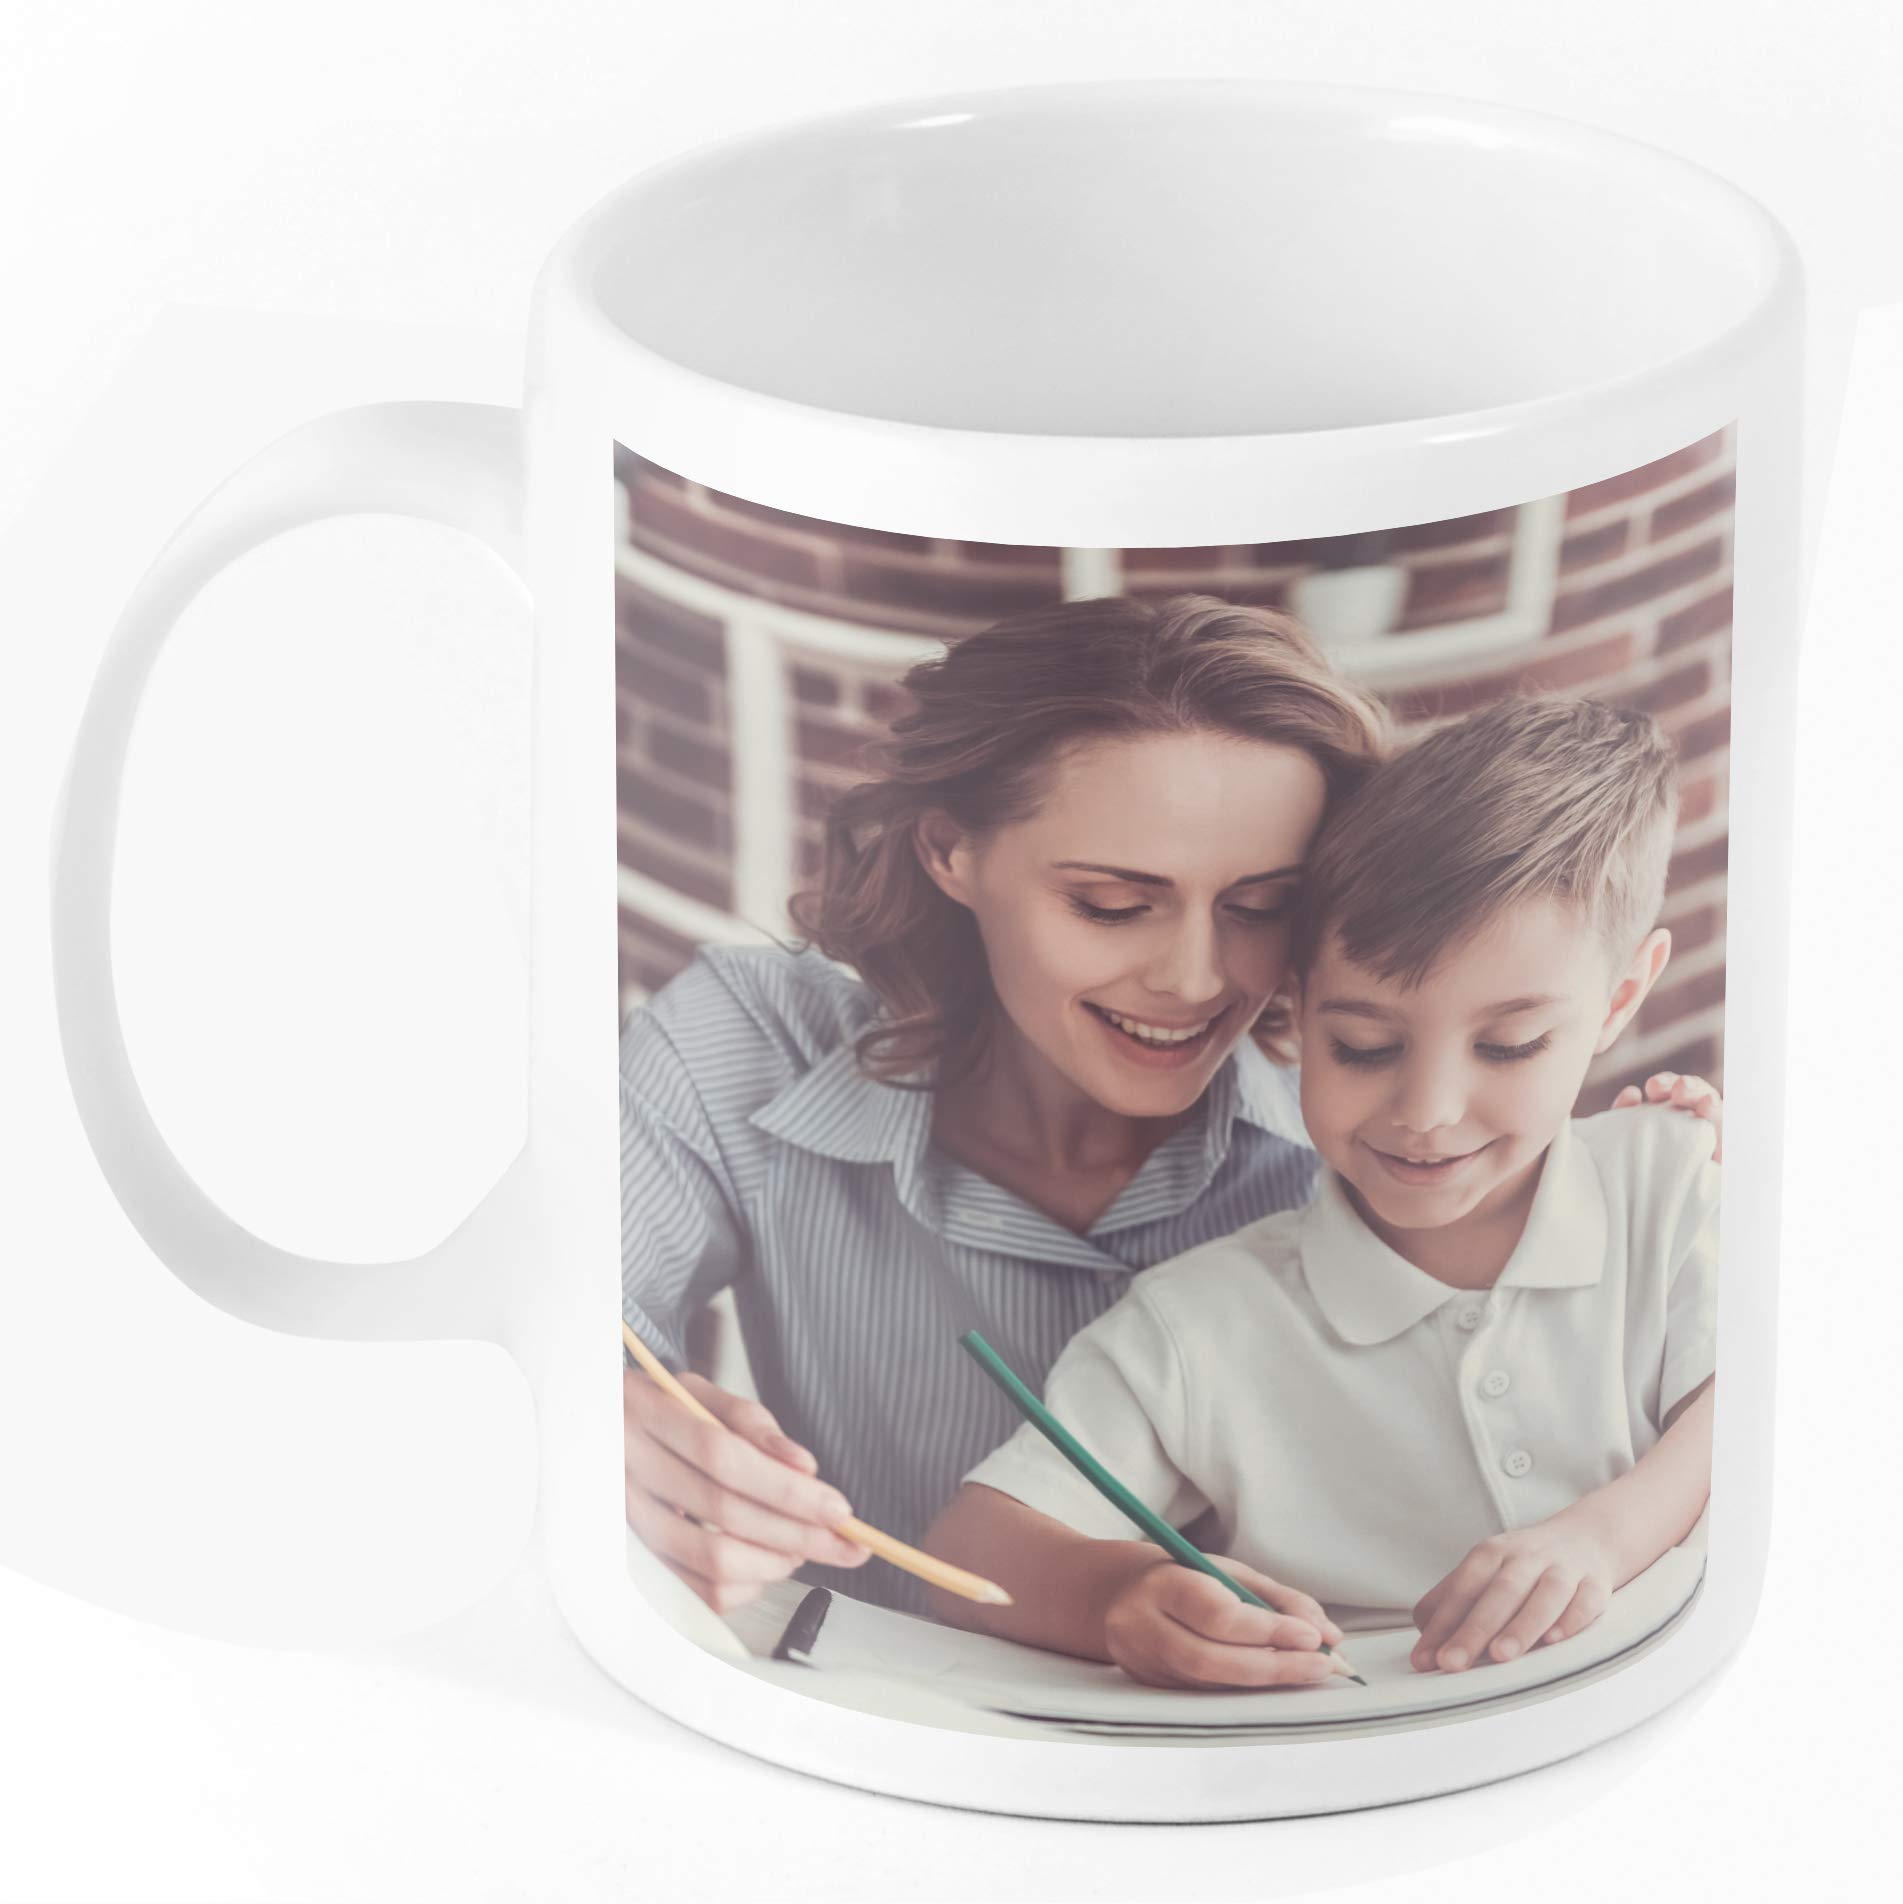 Amazon Com Custom Coffee Mugs W Photo Customized Large Coffee Mug Add Photo Logo Picture Or Text On Personalized Coffee Mug Ceramic Custom Christmas Photo Mug For Mom Dad And Office Tazas